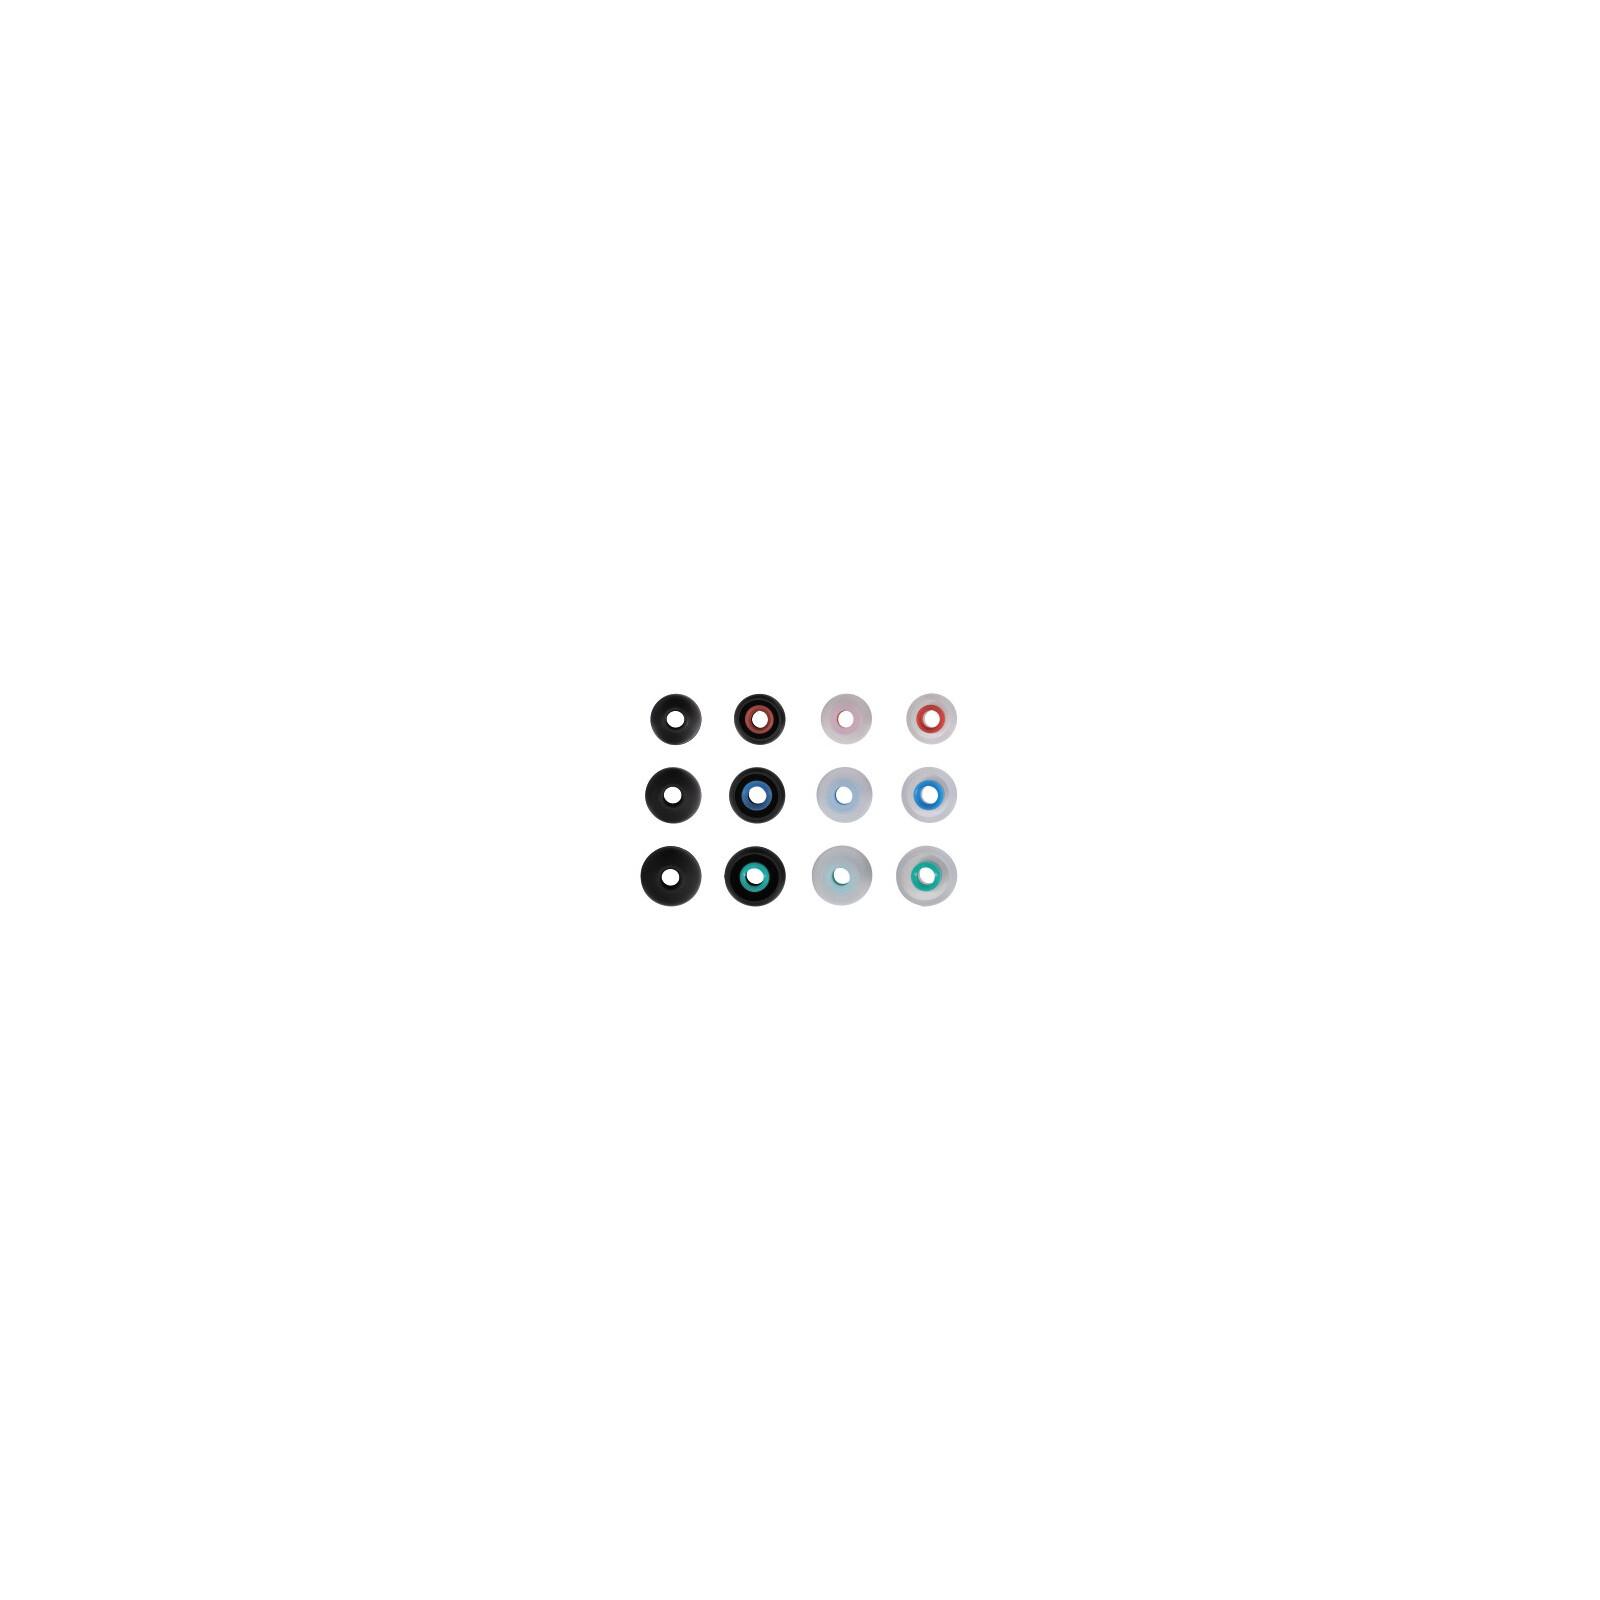 Hama 122681 Ersatzohrpolster Silikon Größe S-L